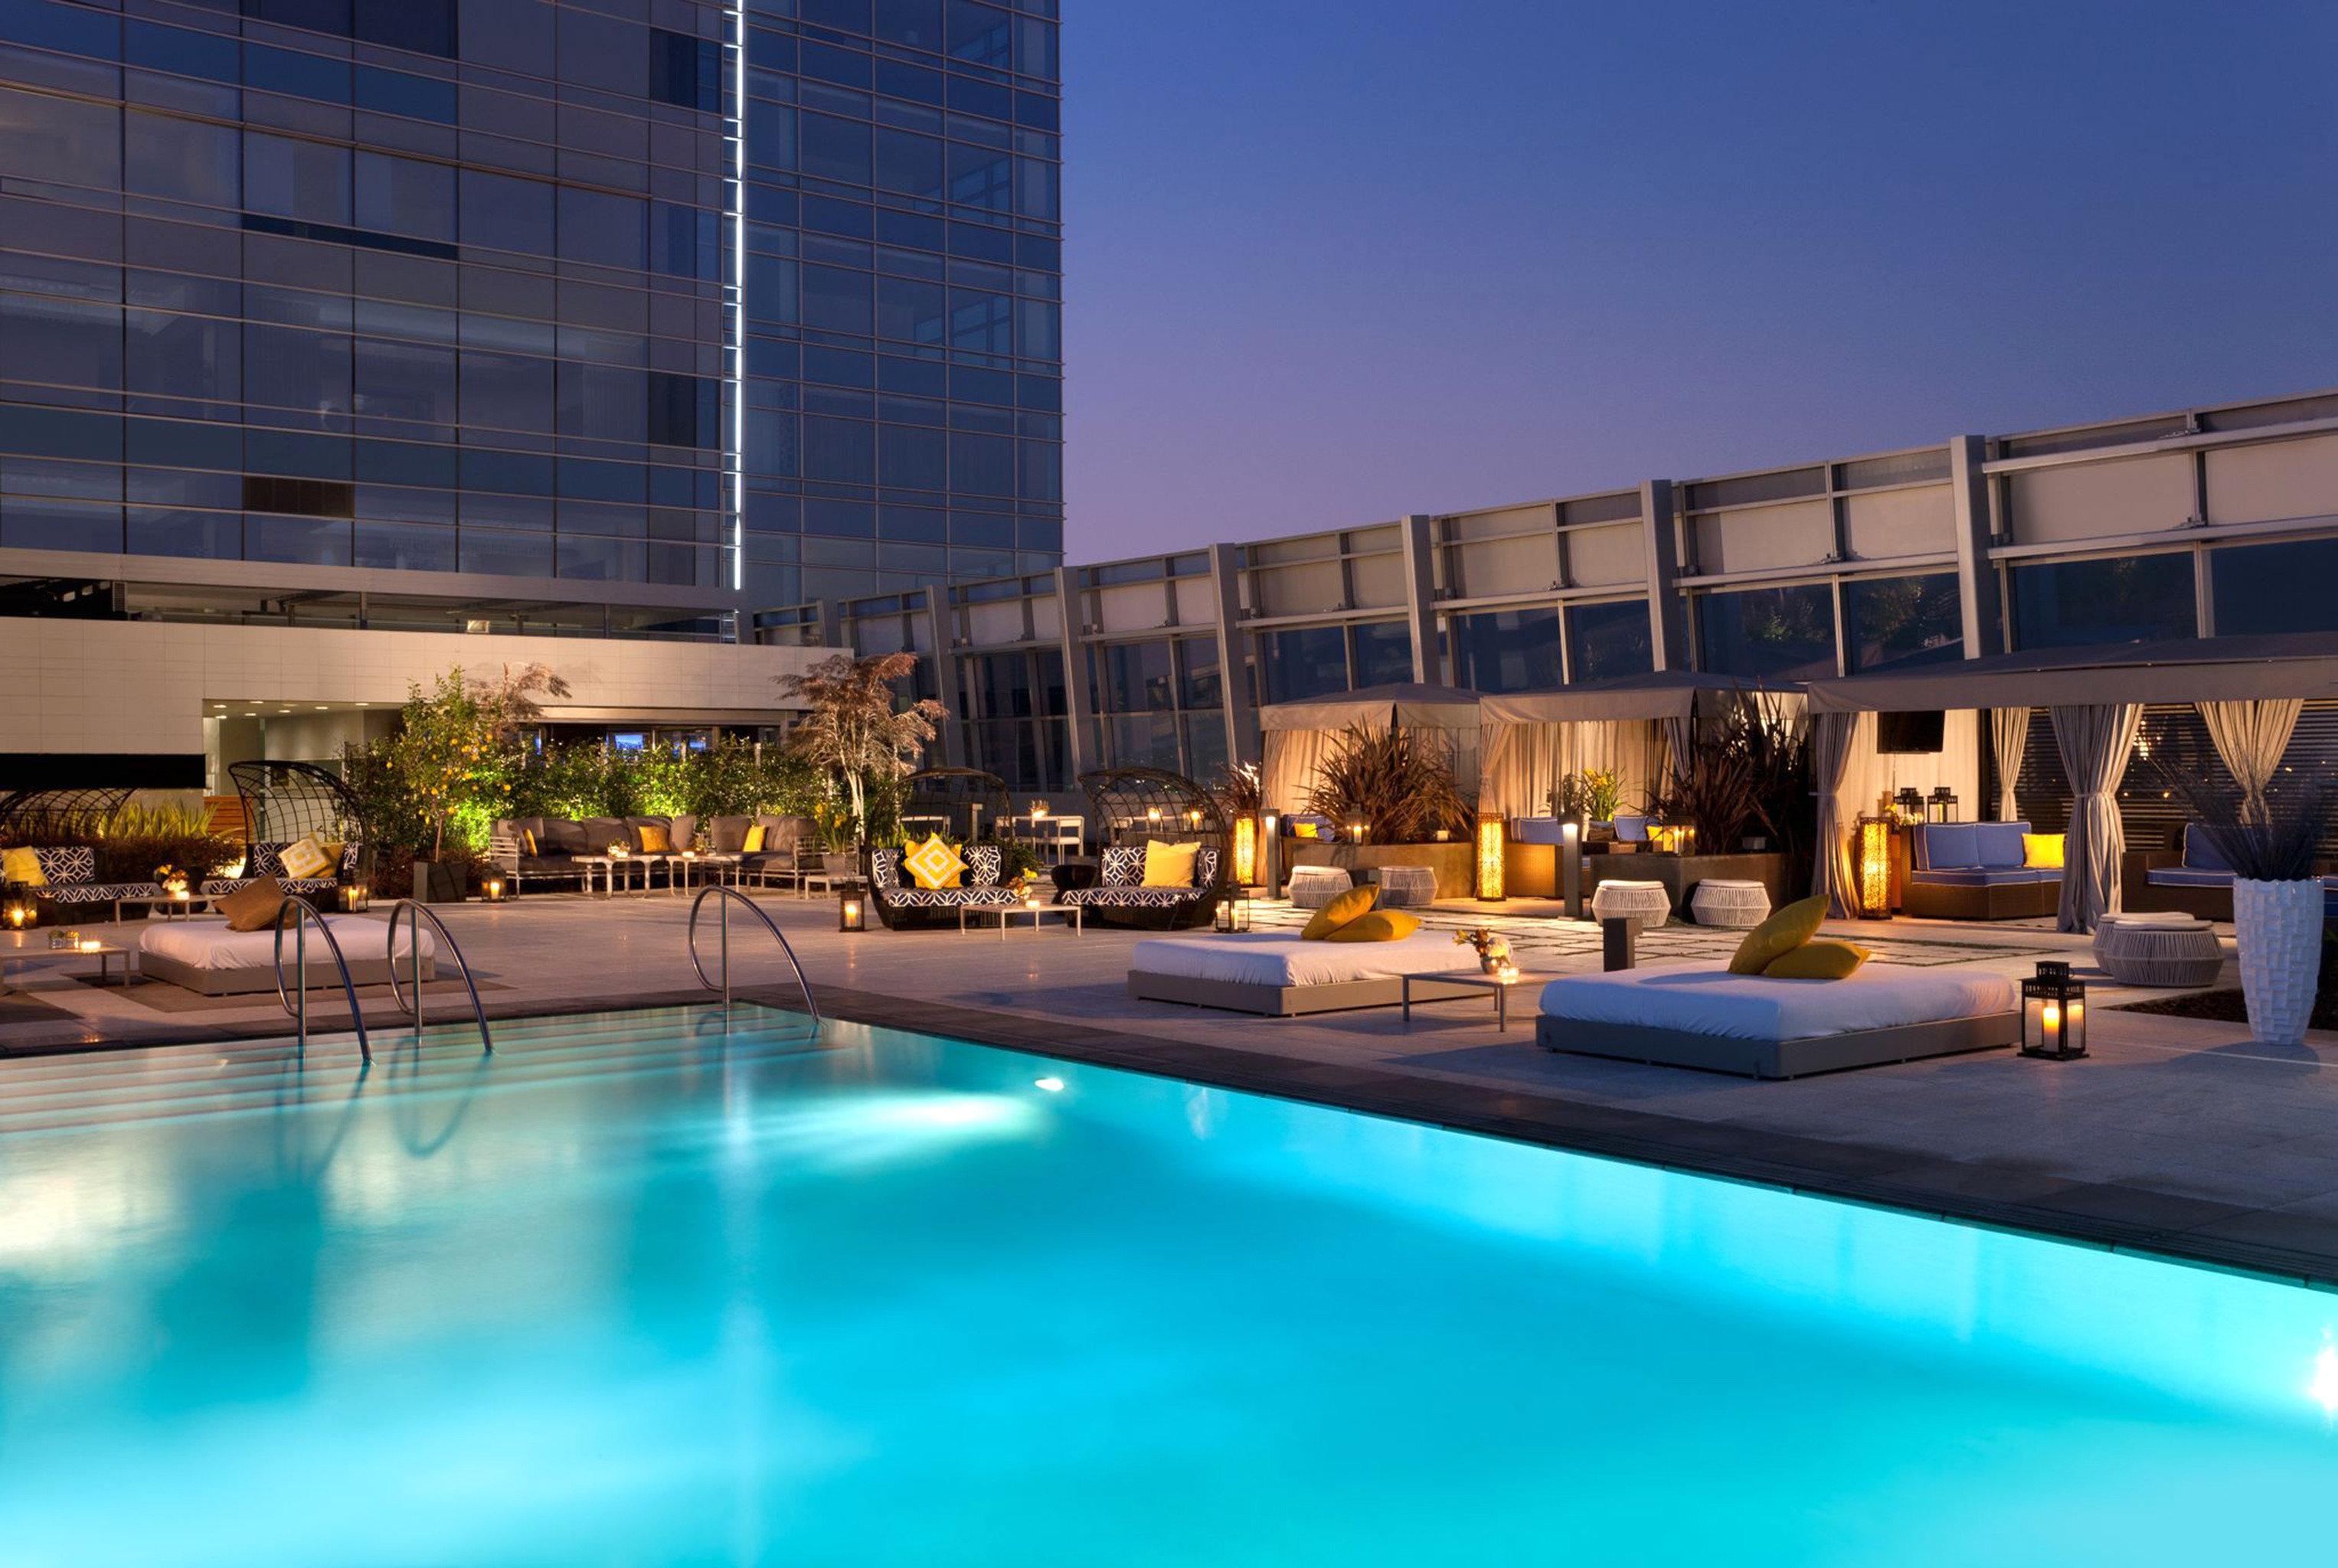 City Elegant Lounge Modern Patio Pool Rooftop sky building swimming pool leisure plaza Resort leisure centre reflecting pool condominium convention center headquarters blue